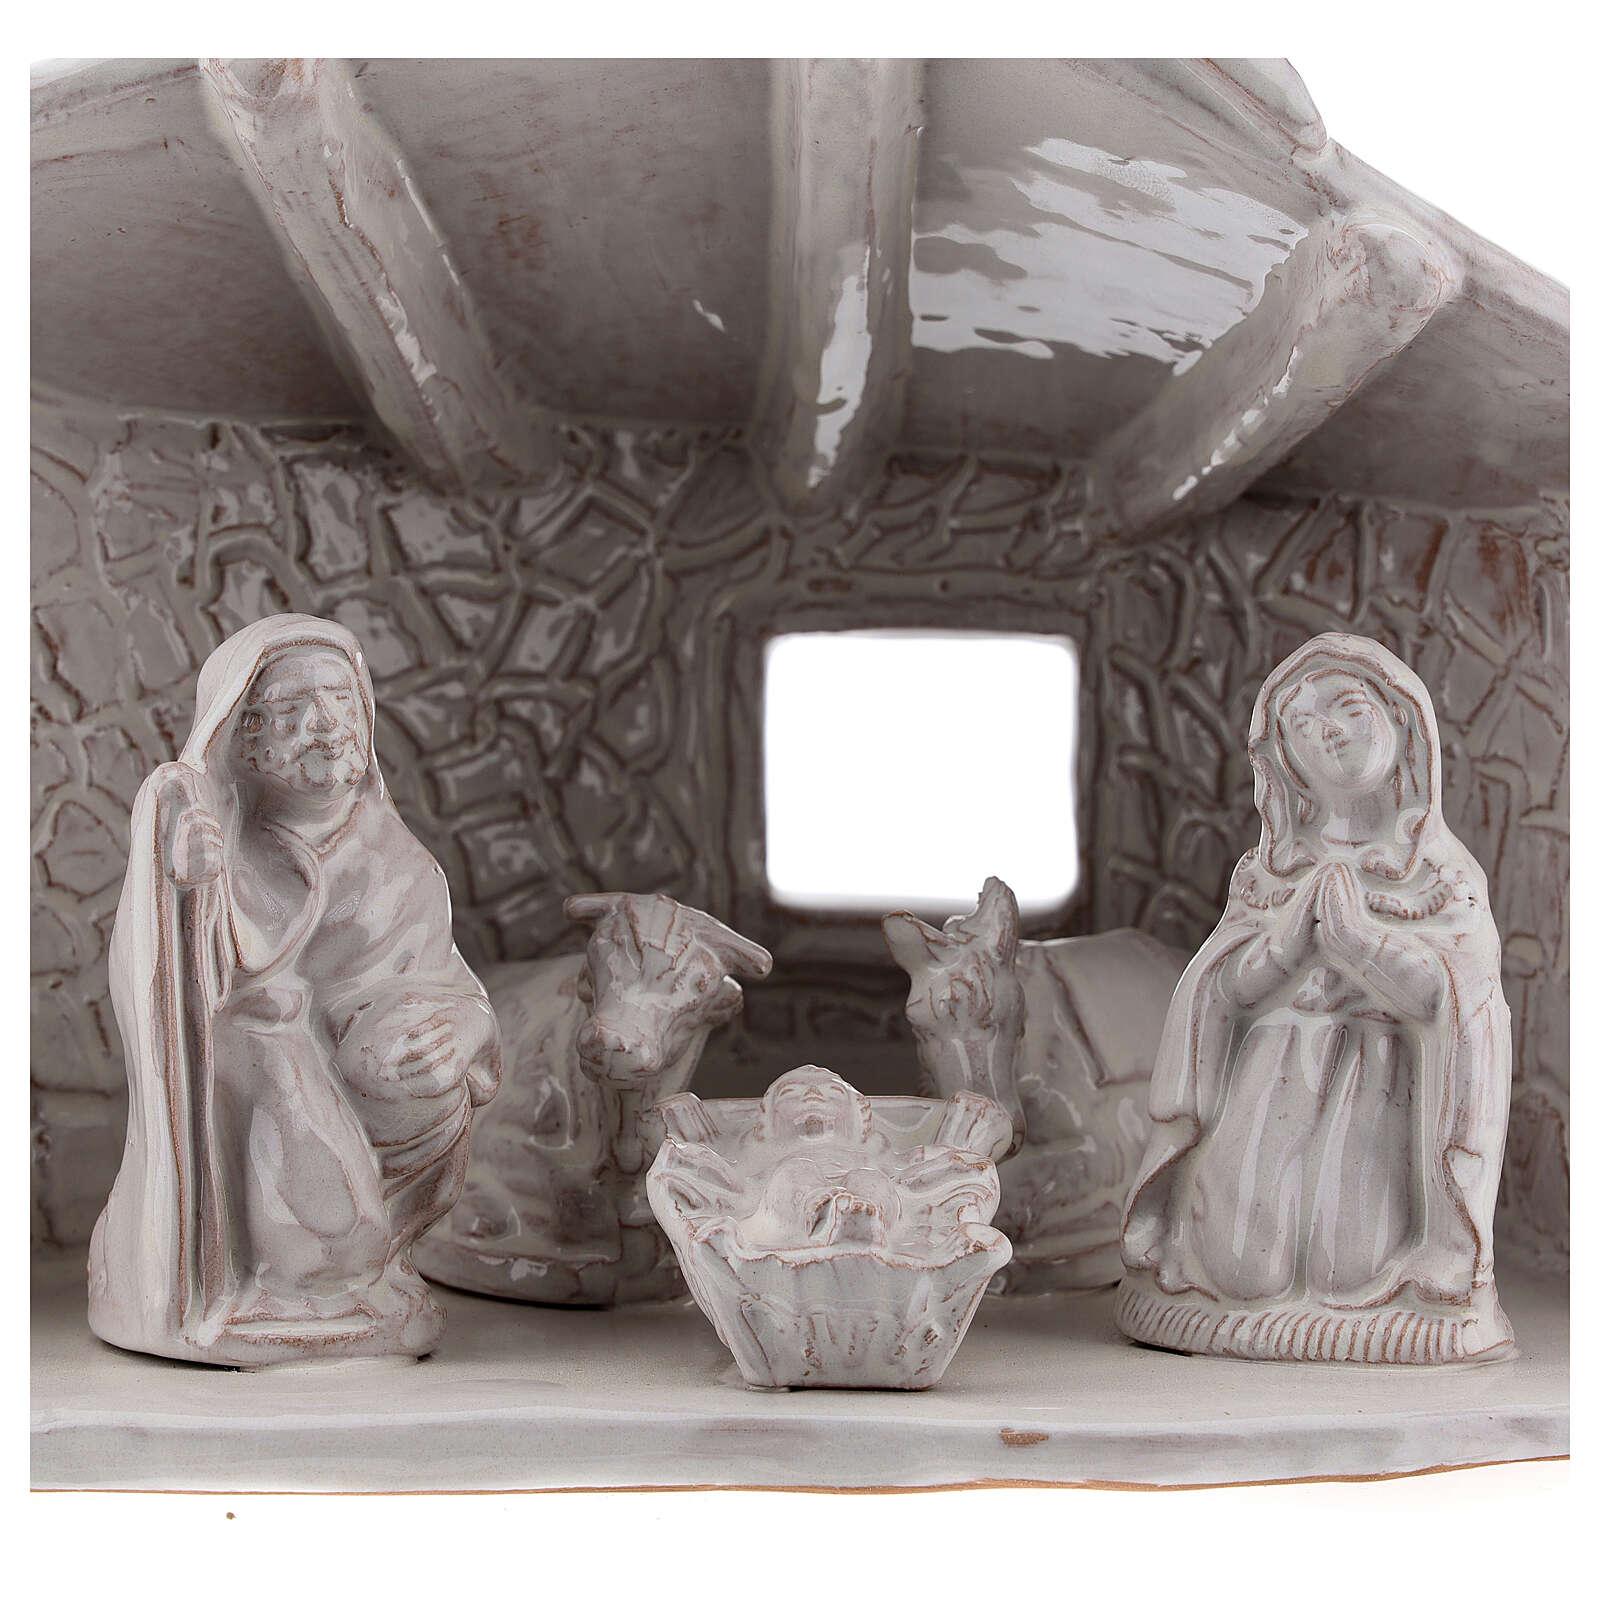 Capanna Sacra Famiglia travi muri in sasso terracotta bianca Deruta 20 cm 4